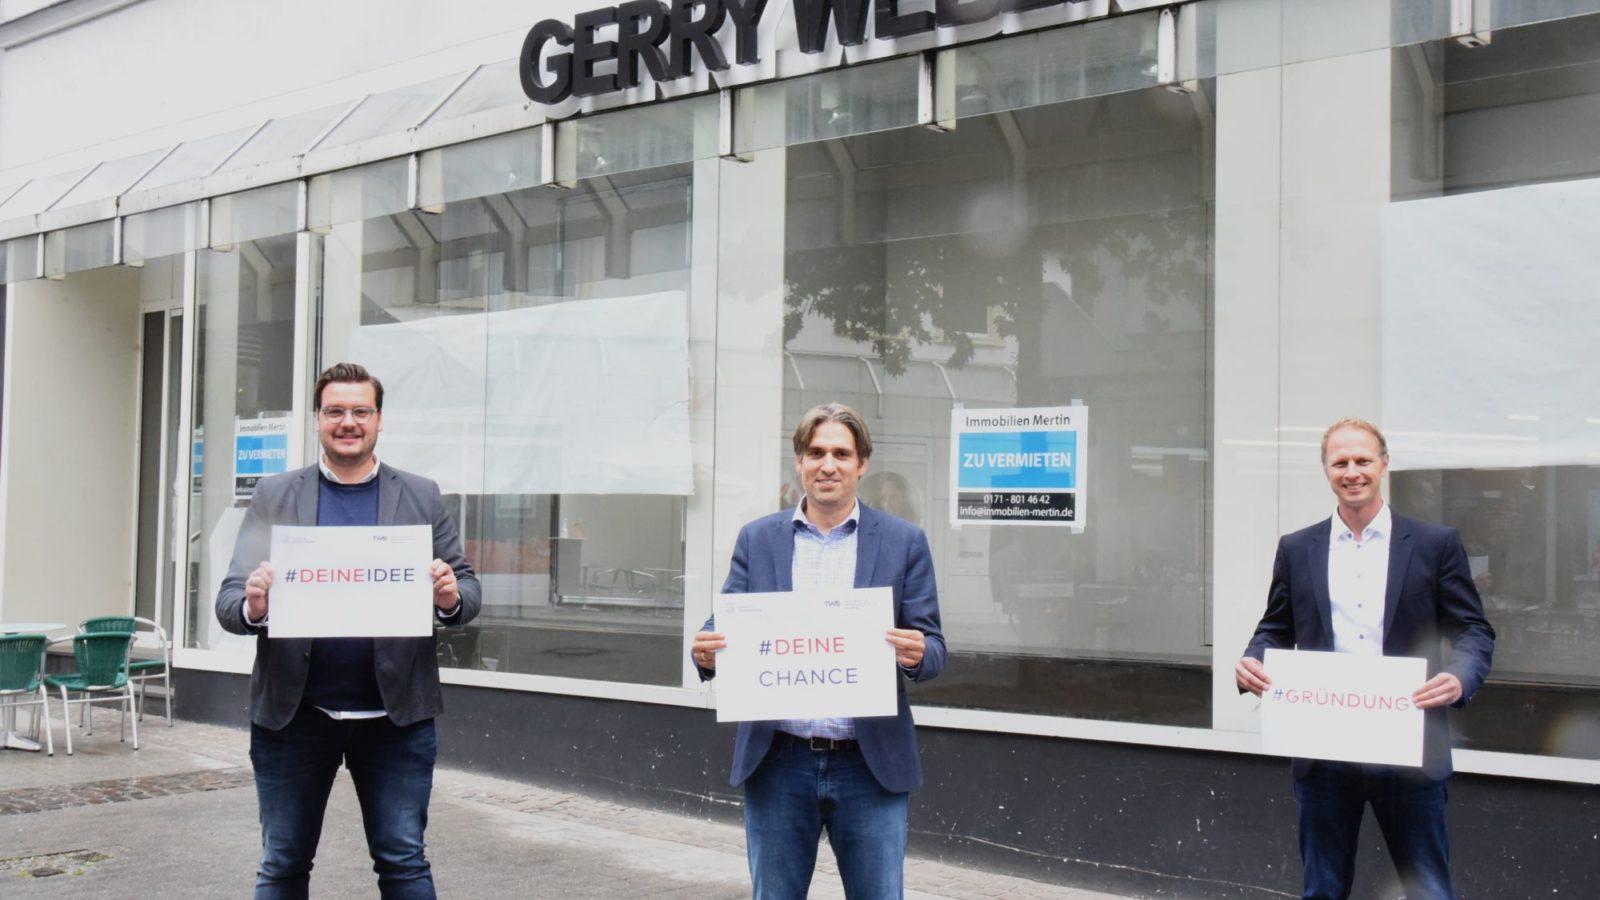 V.l.n.r. Michael Kersting (schwerte Stadtmarketing), Christian Vöcks (stadt Schwerte), Jens Ewald (tws) ©ingo Rous Stadt Schwerte